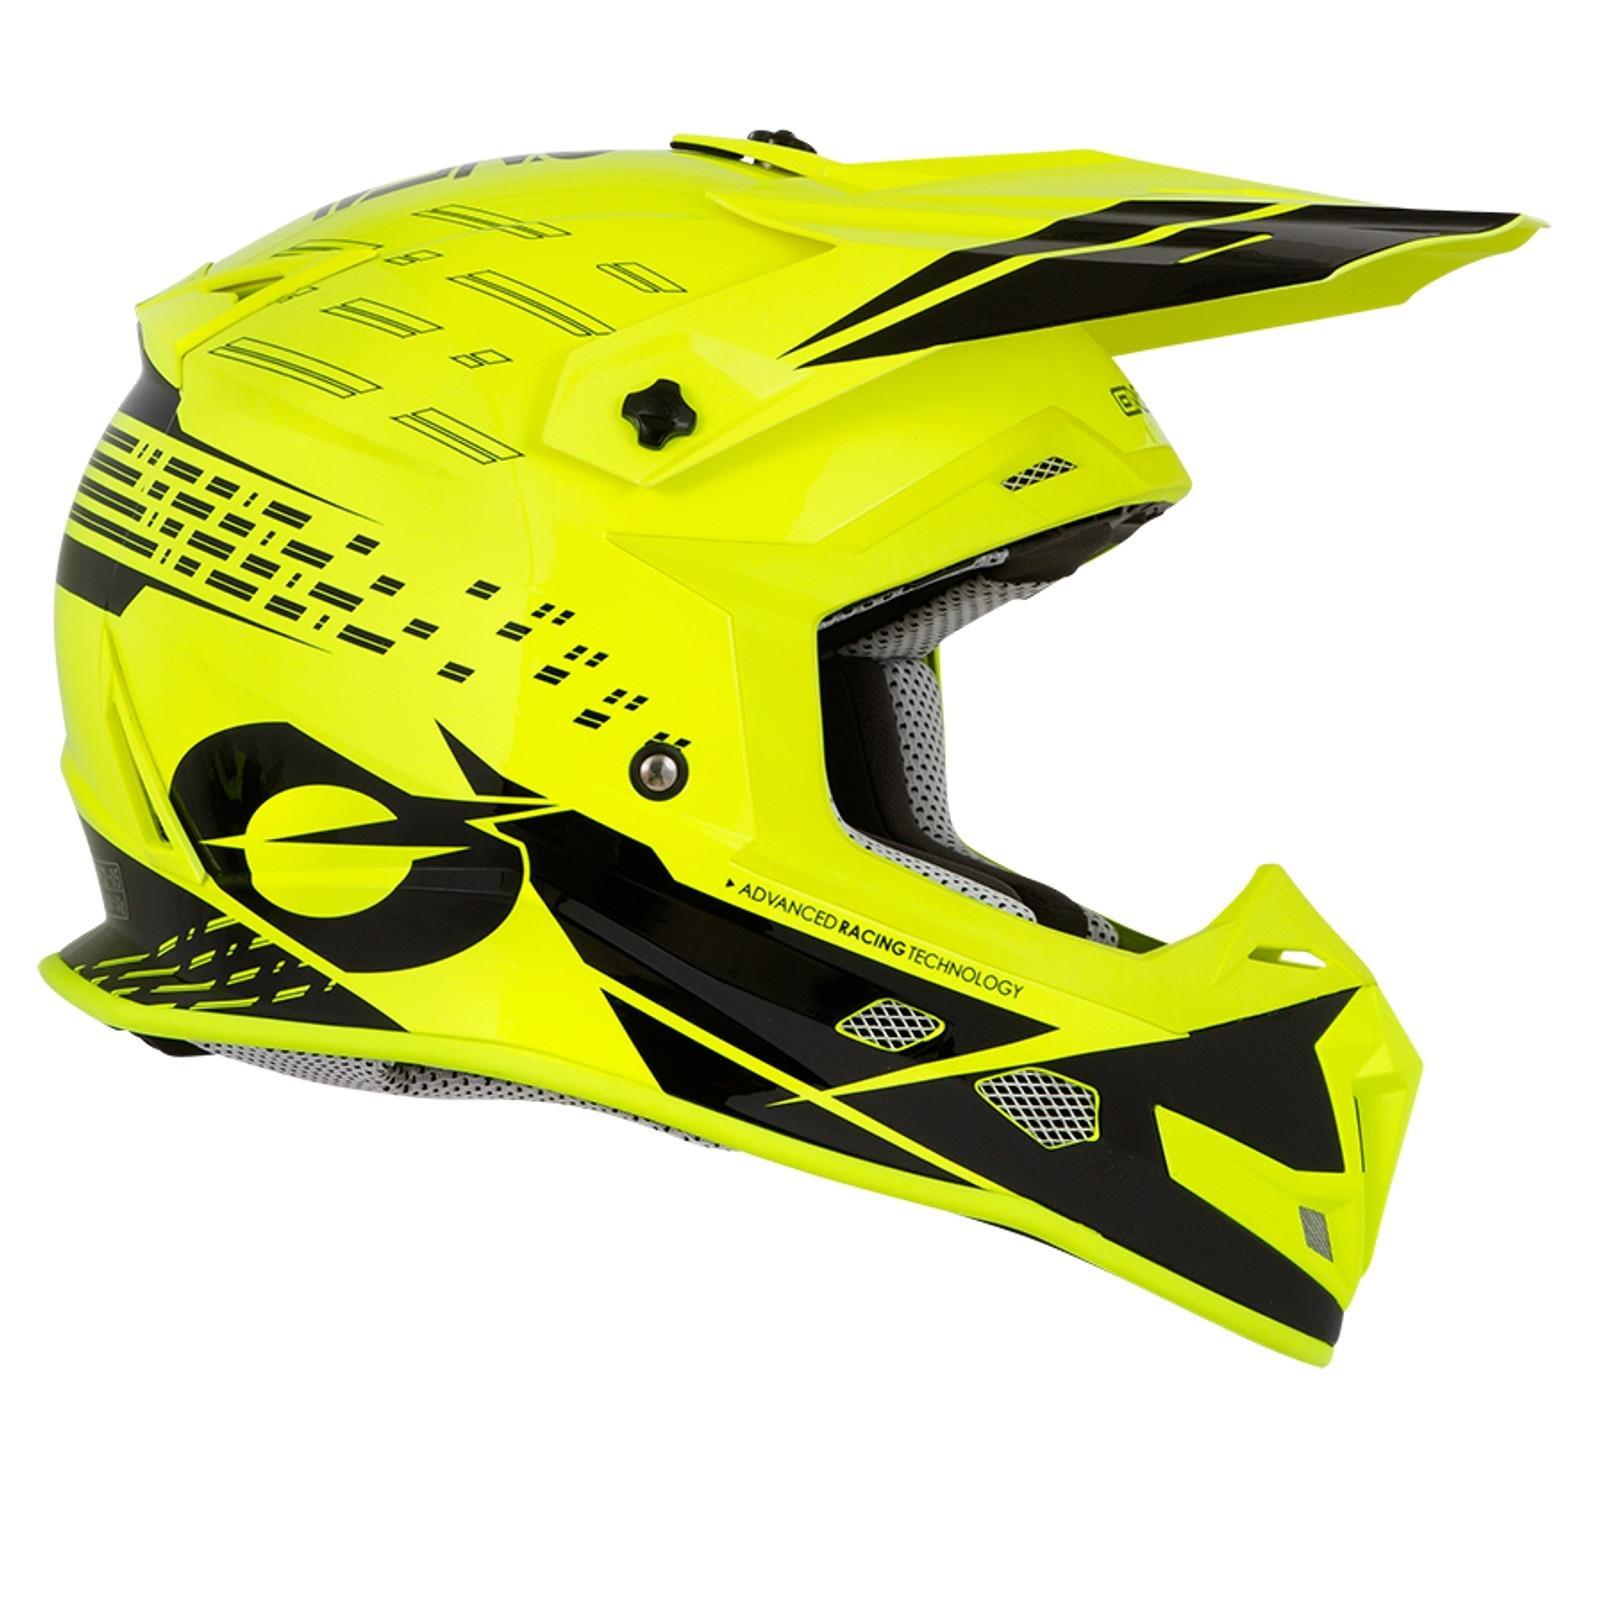 ONeal-Motocross-casco-MX-ENDURO-MOTO-BICI-FUORISTRADA-CROSS-Series-Adventure miniatura 59